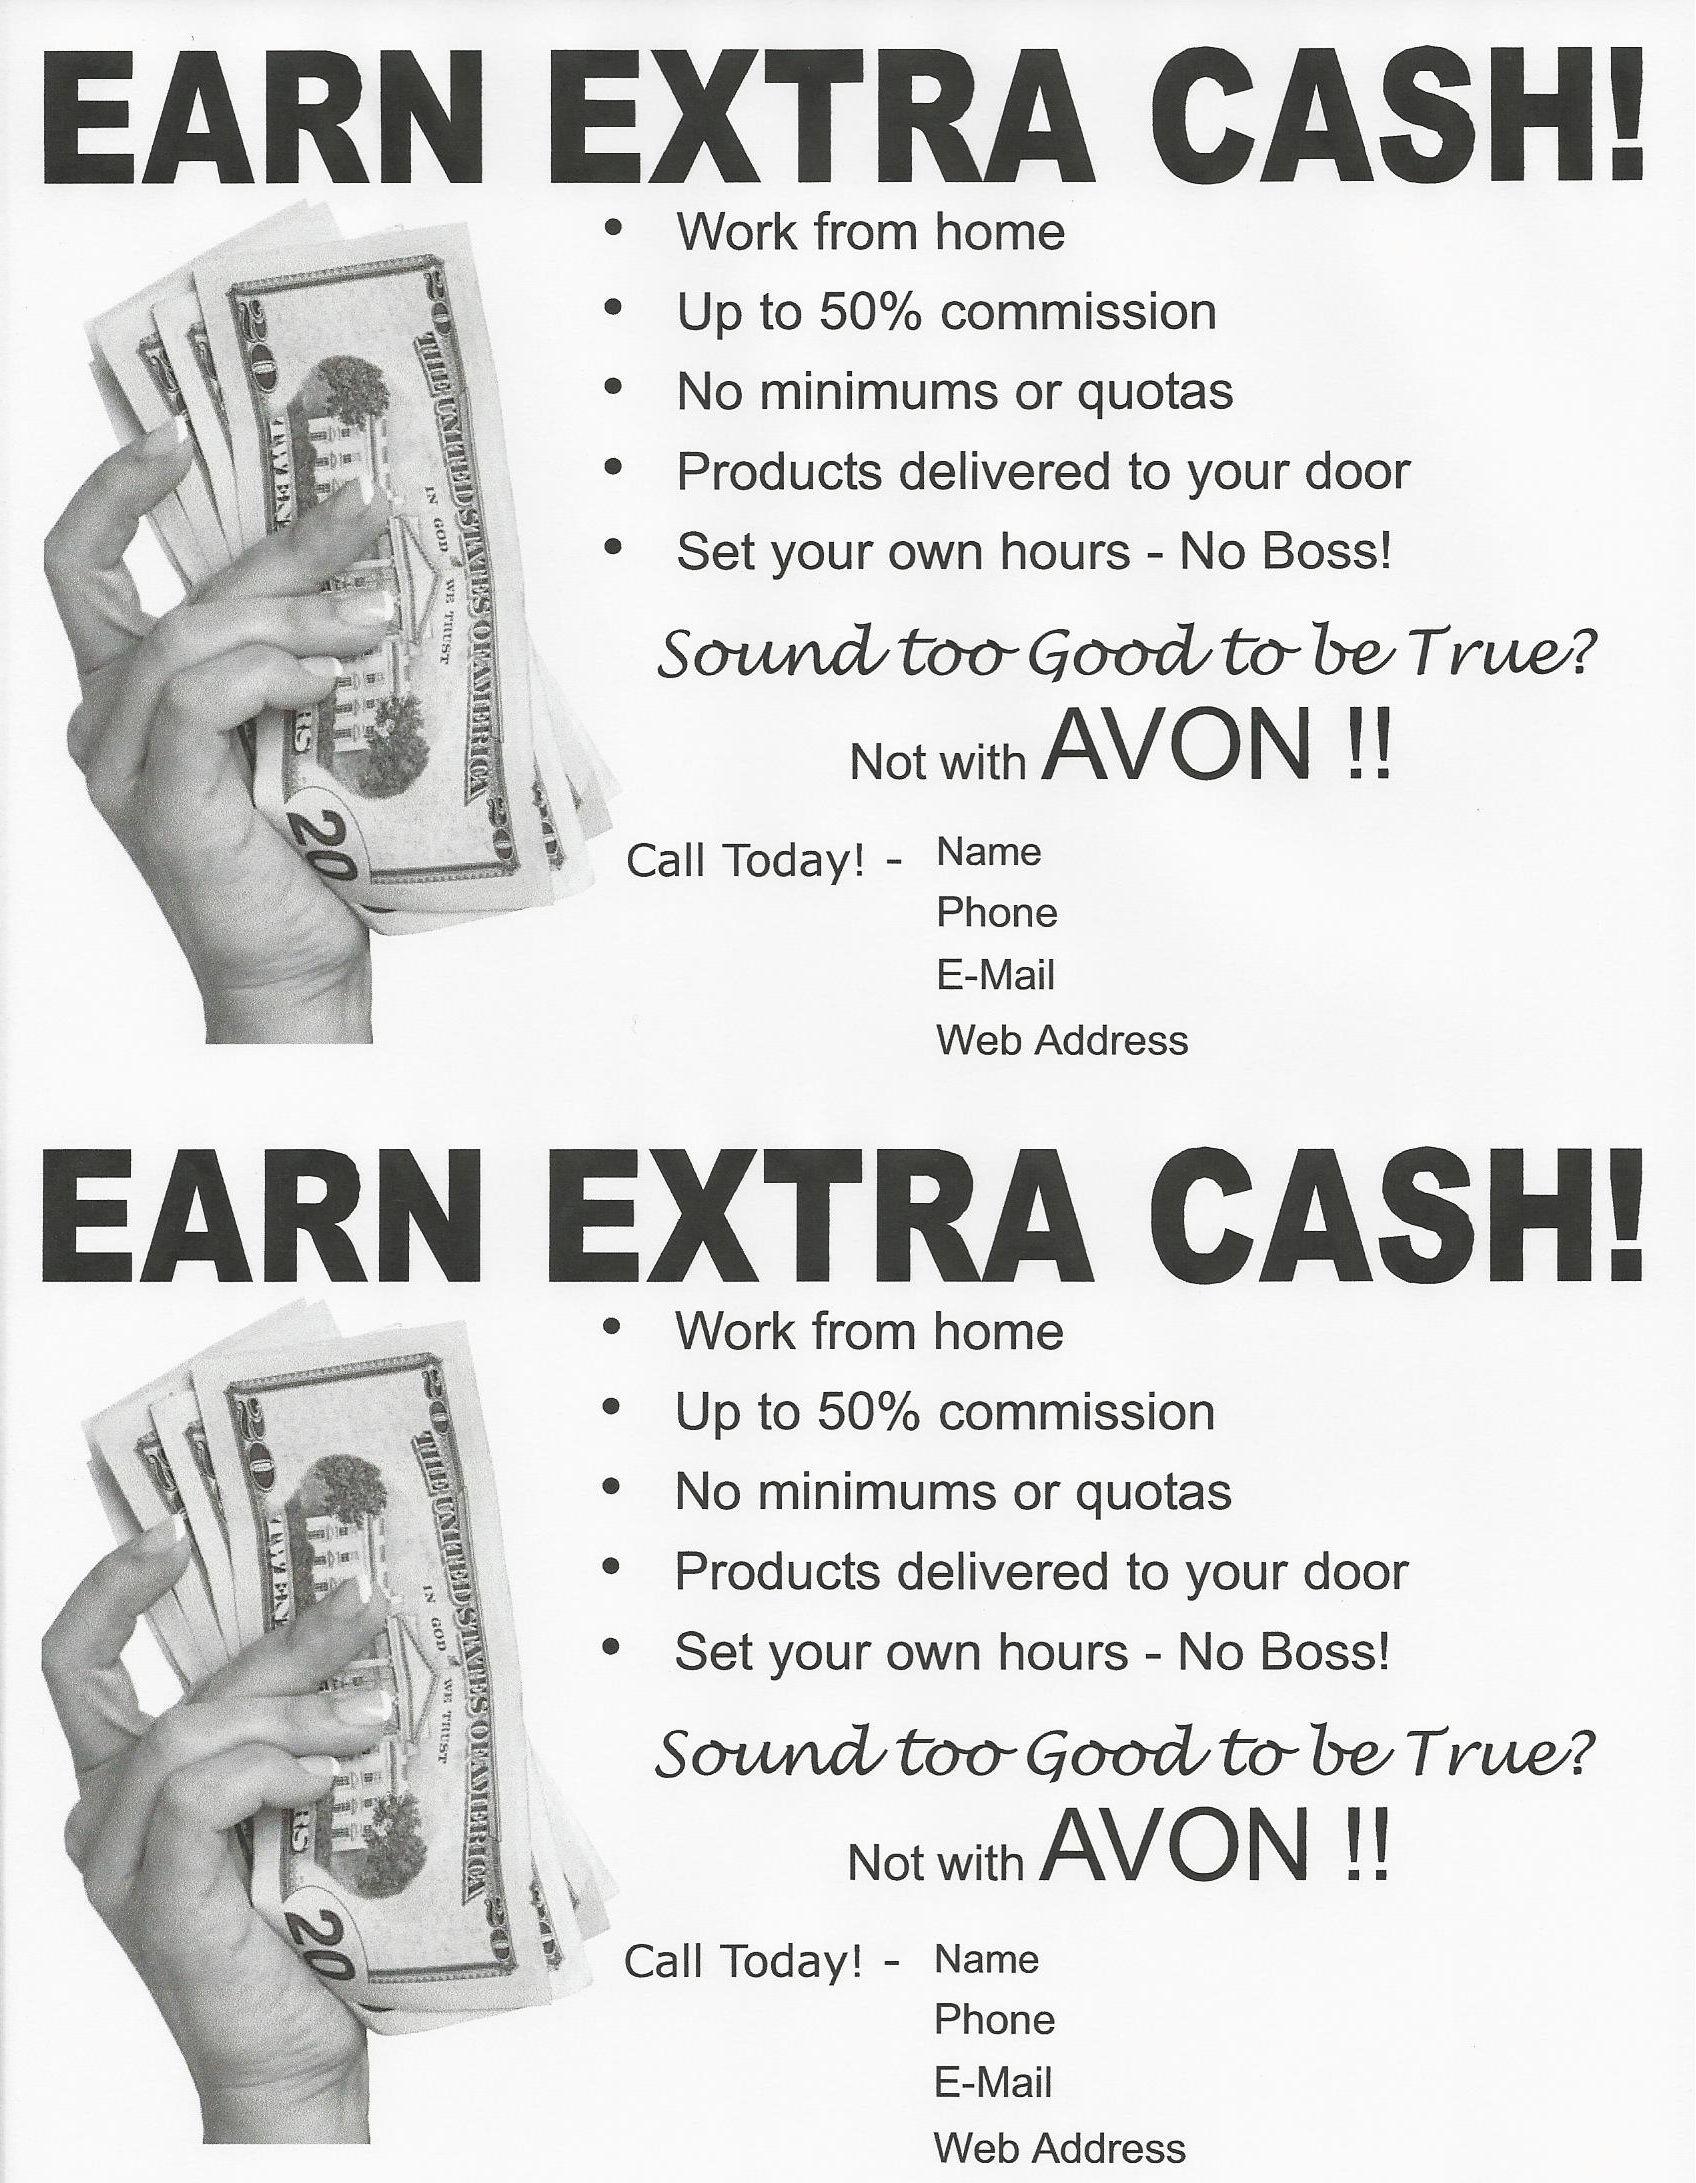 Earn Extra Cash Recruiting Flyer